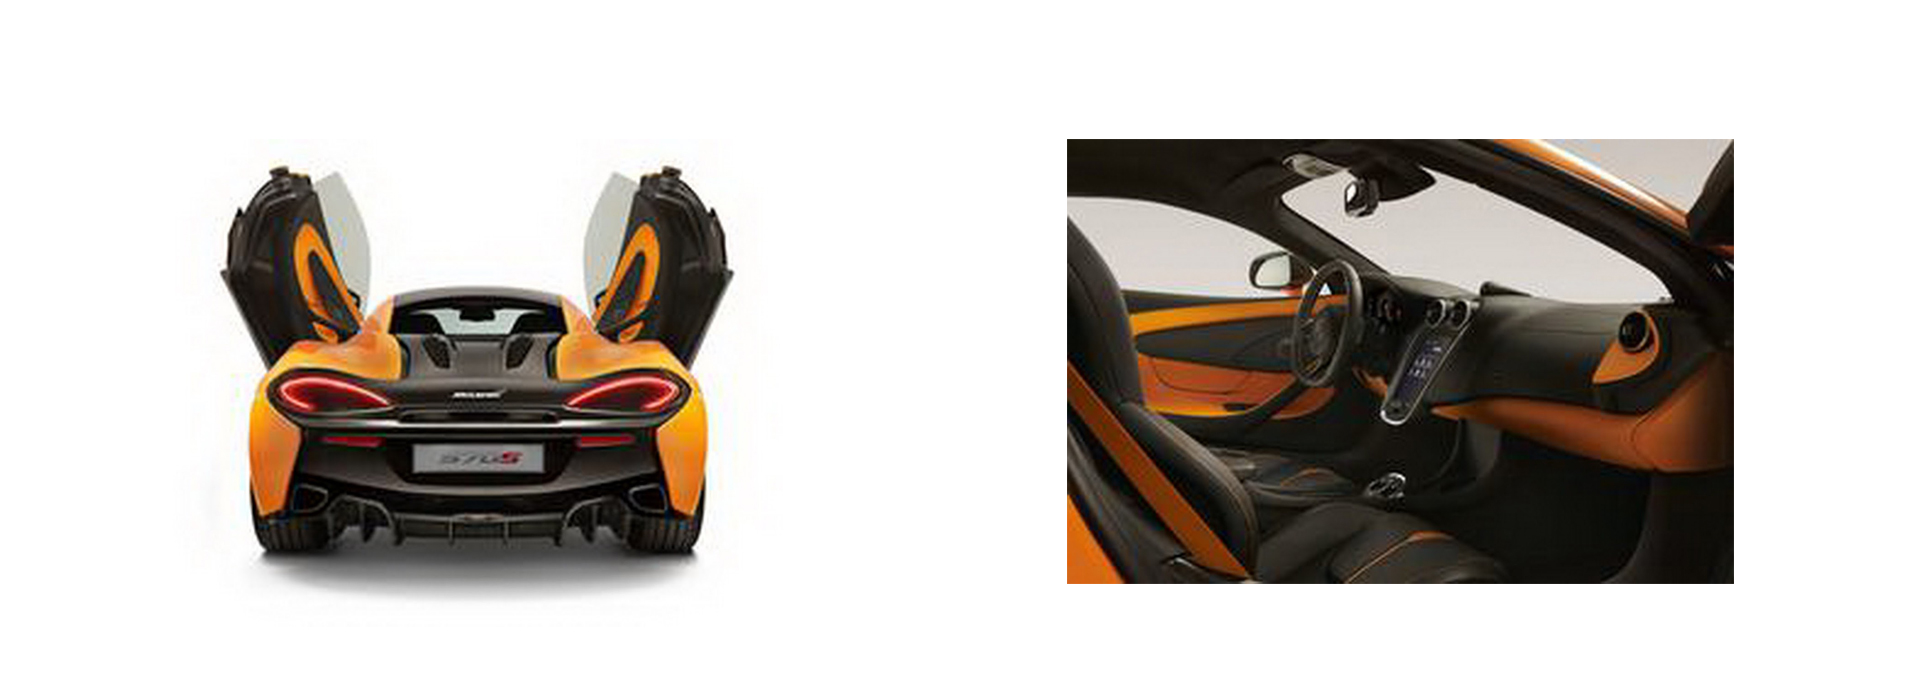 McLaren 570S - pre reveal photo - portes / intérieur - aperçu